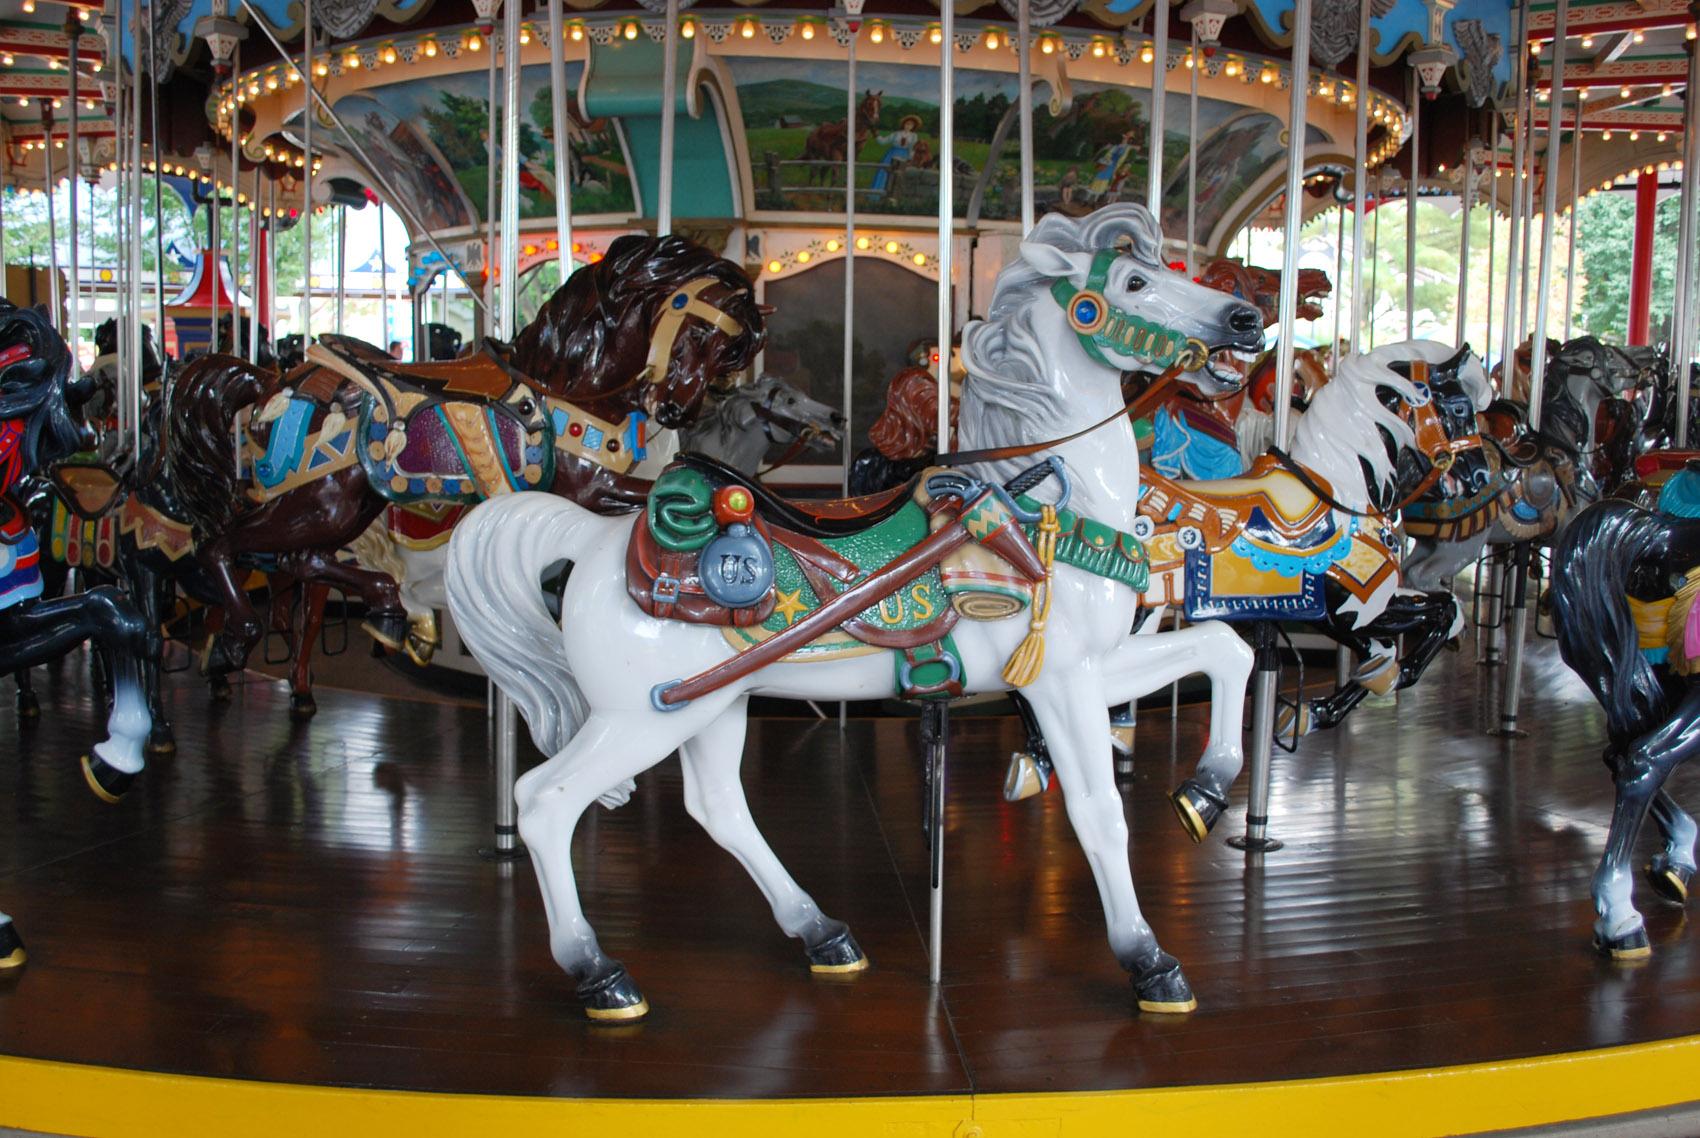 Ca-1919-Hersheypark-PTC-47-carousel-horse-0297